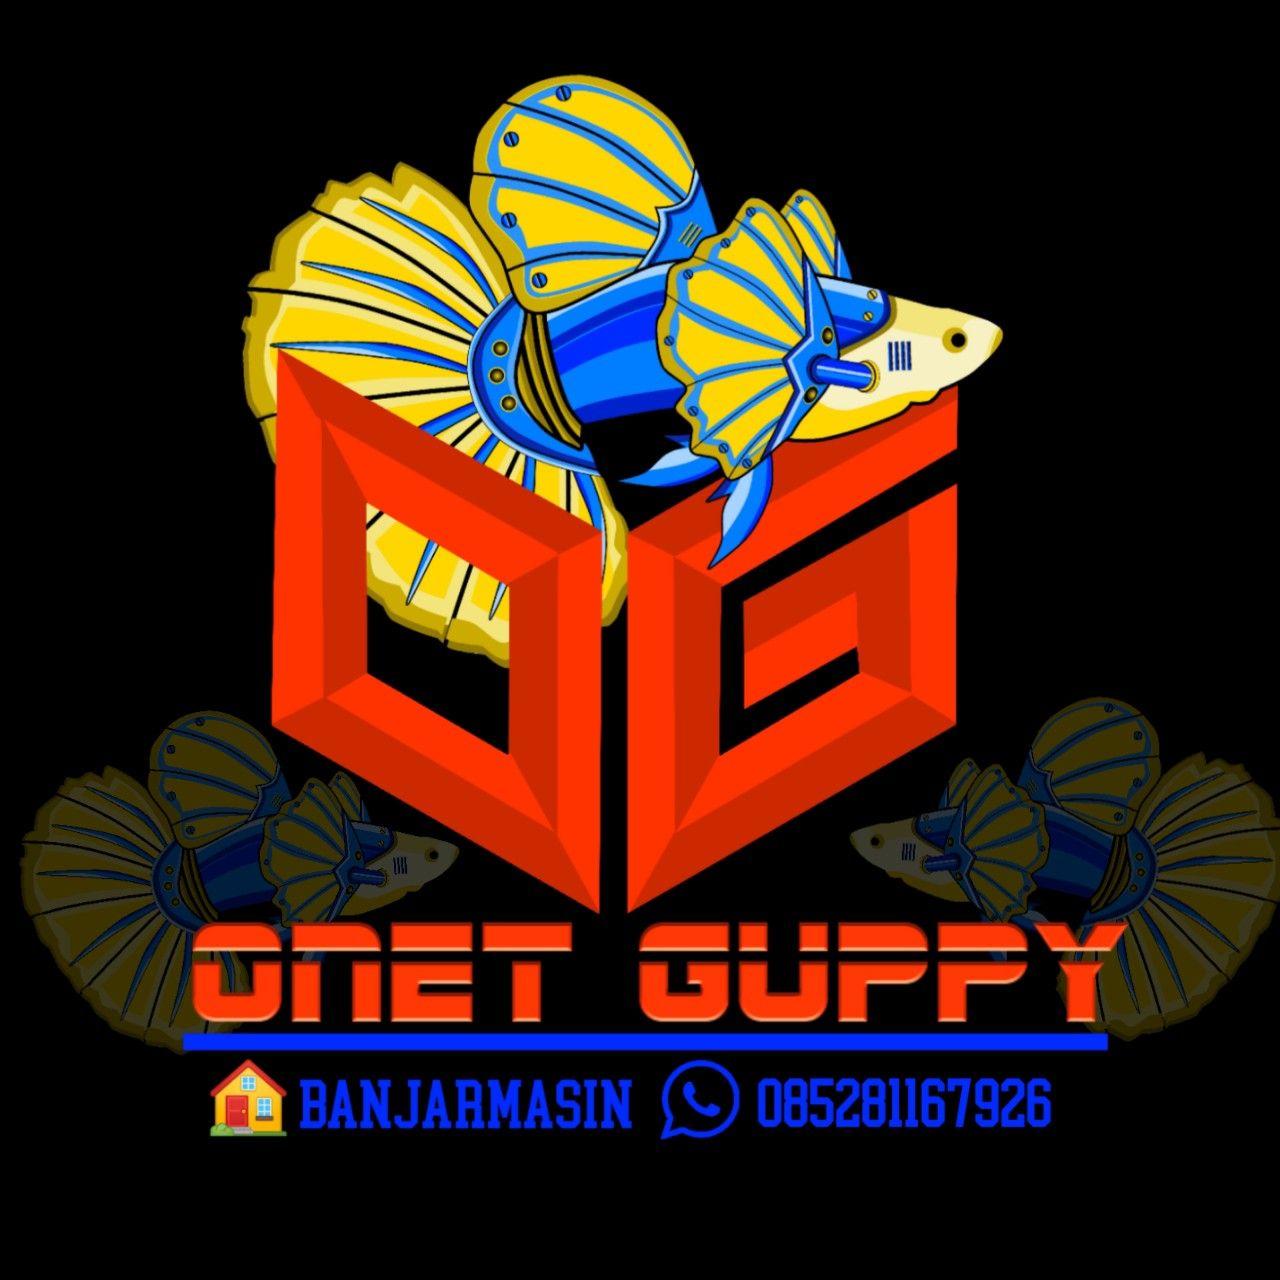 Guppy Robot Desain Banner Desain Logo Bingkai Foto